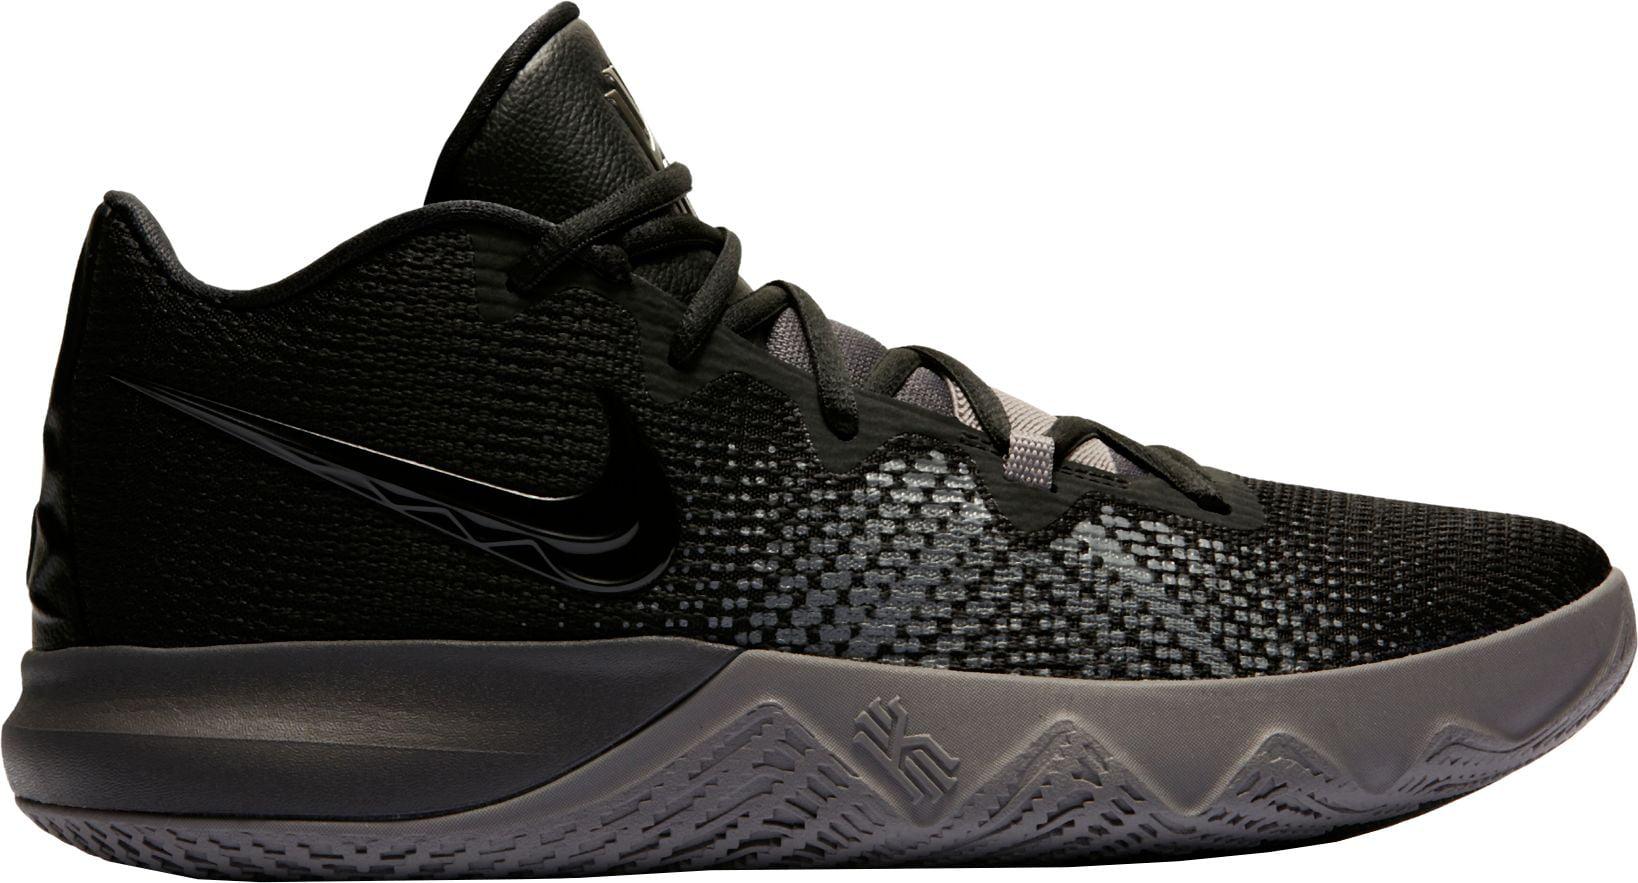 Nike Men's Kyrie Flytrap Basketball